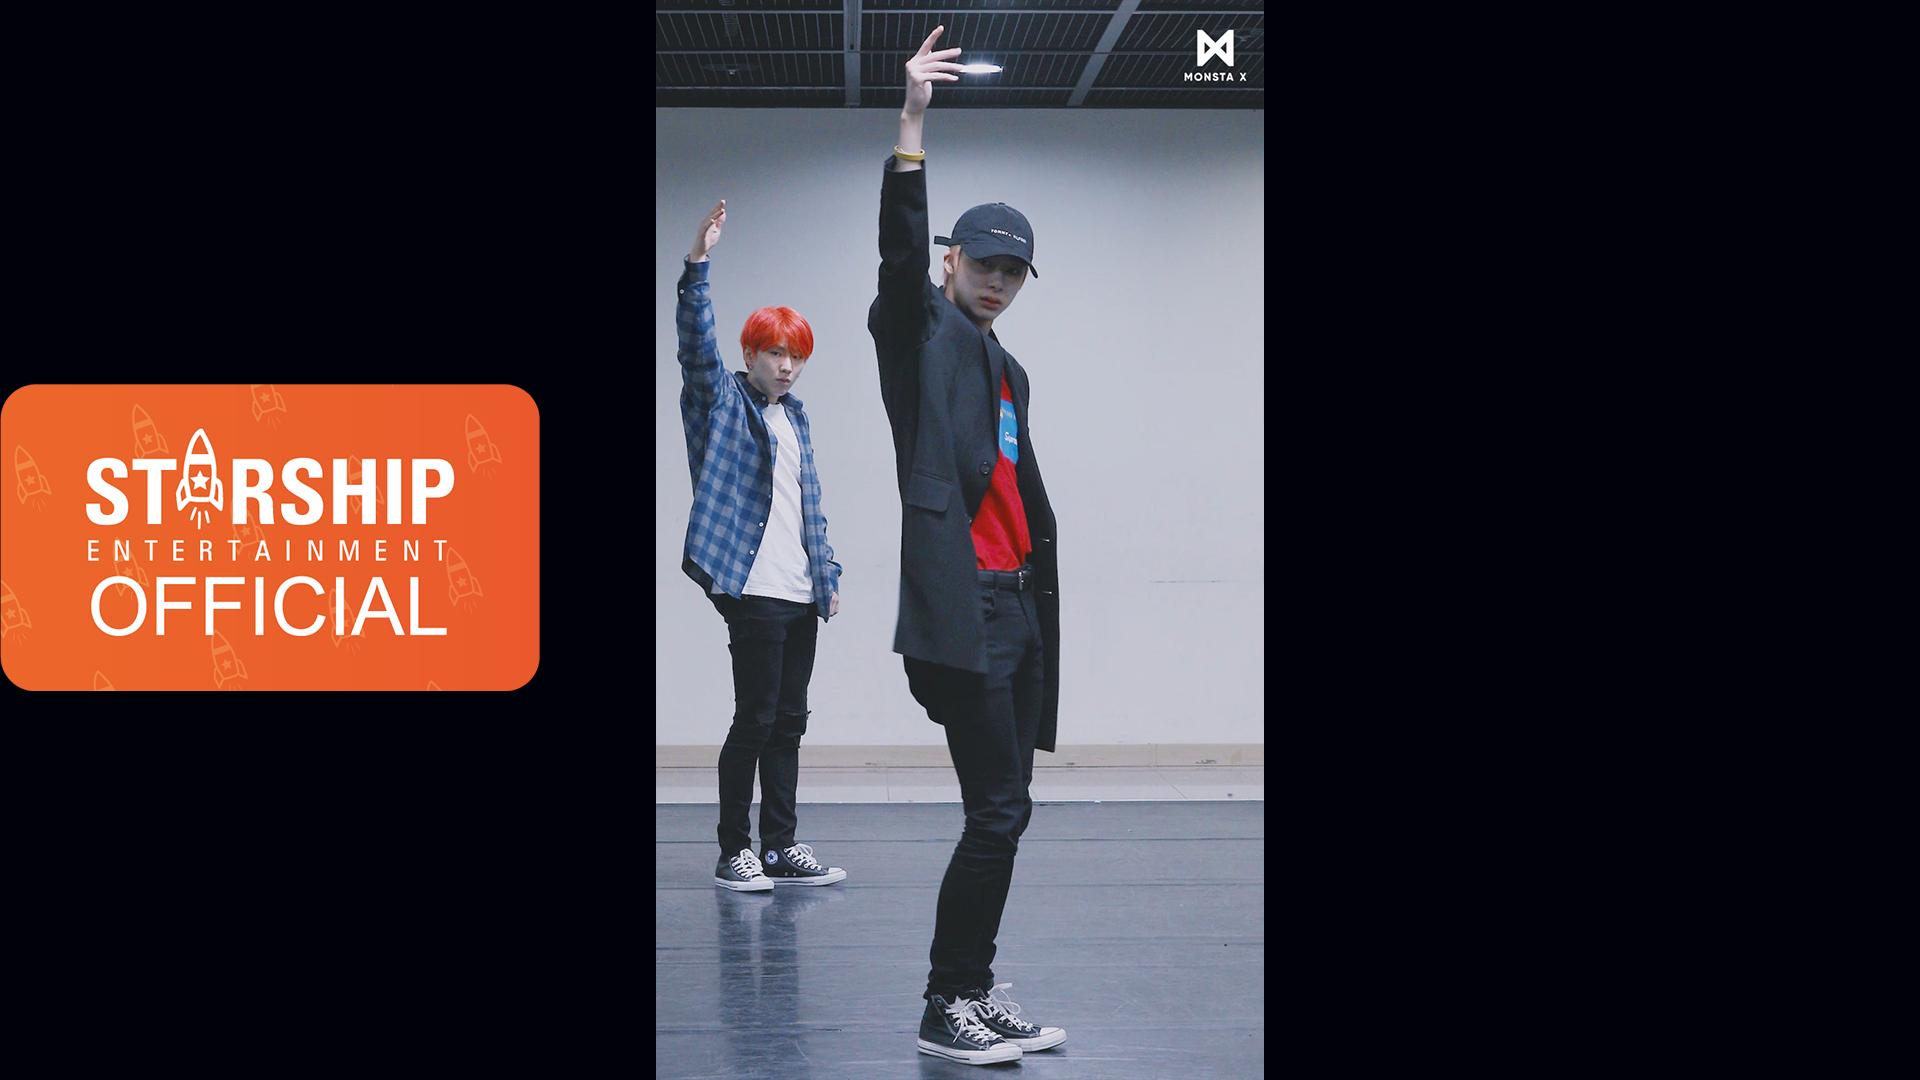 [HYUNGWON][Dance Practice] 몬스타엑스 (MONSTA X) - 'JEALOUSY' Vertical Video